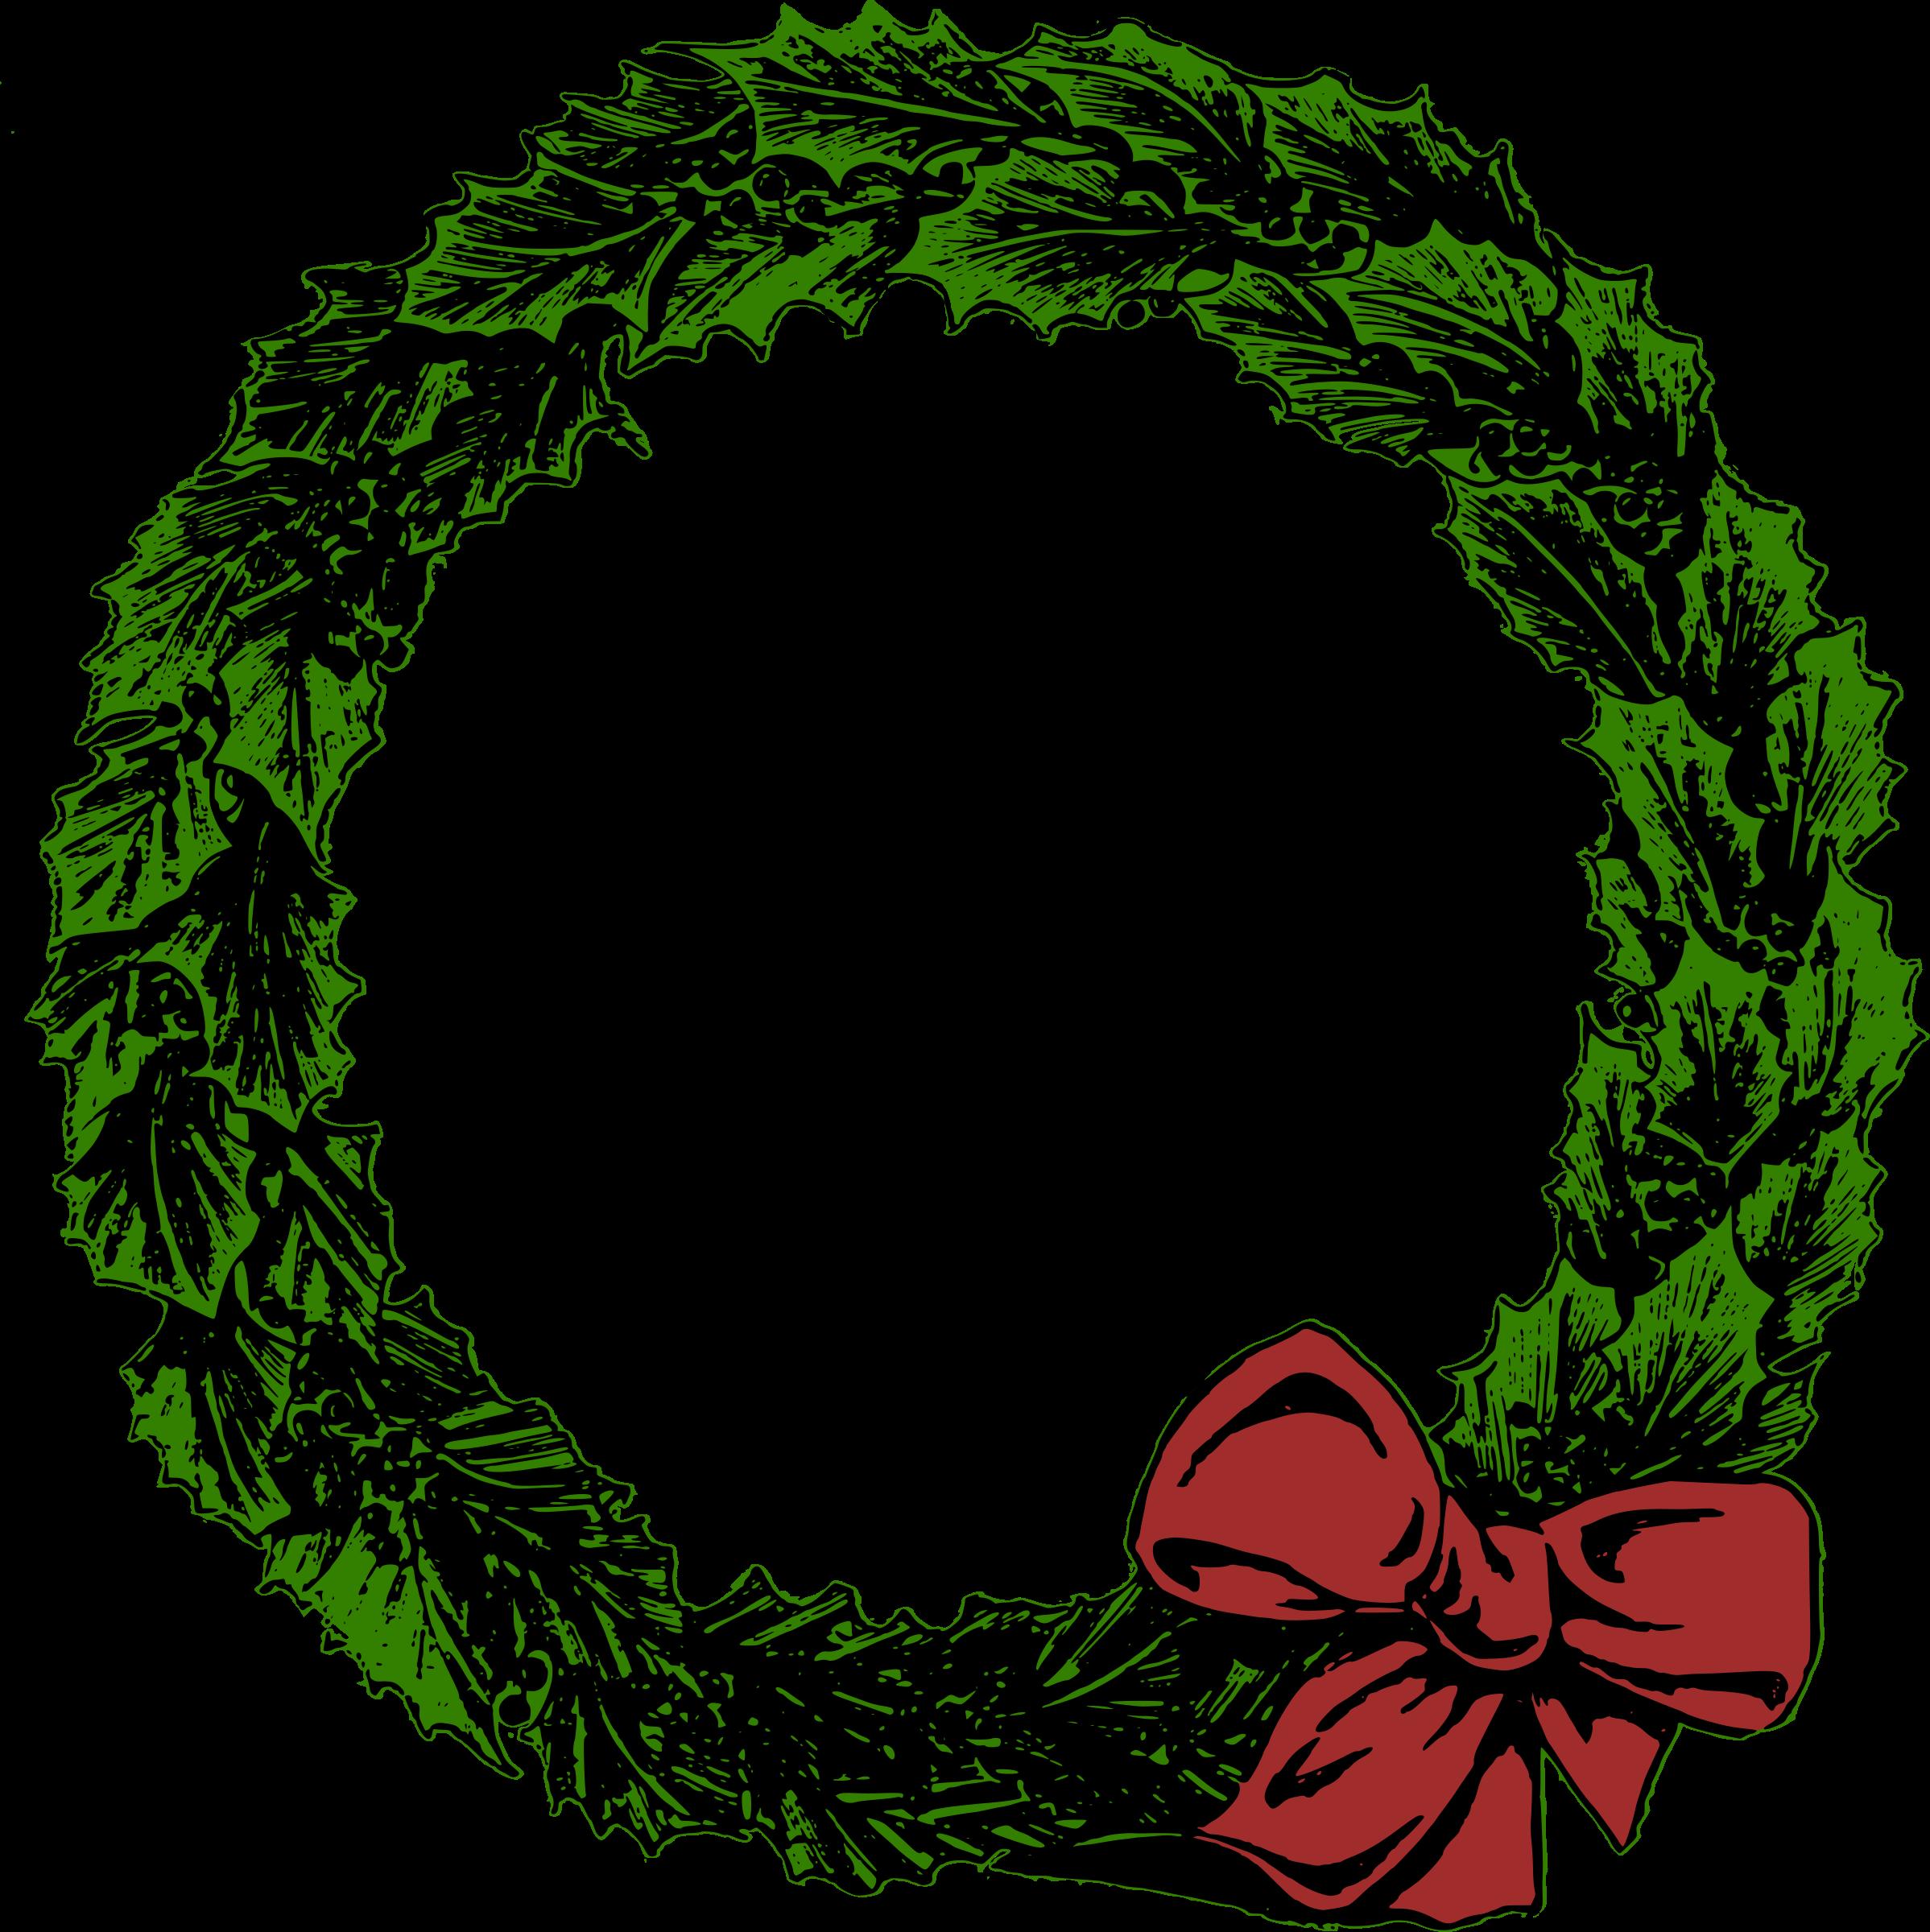 Plain Christmas Wreath Clipart, HD Png Download {#65256 ...